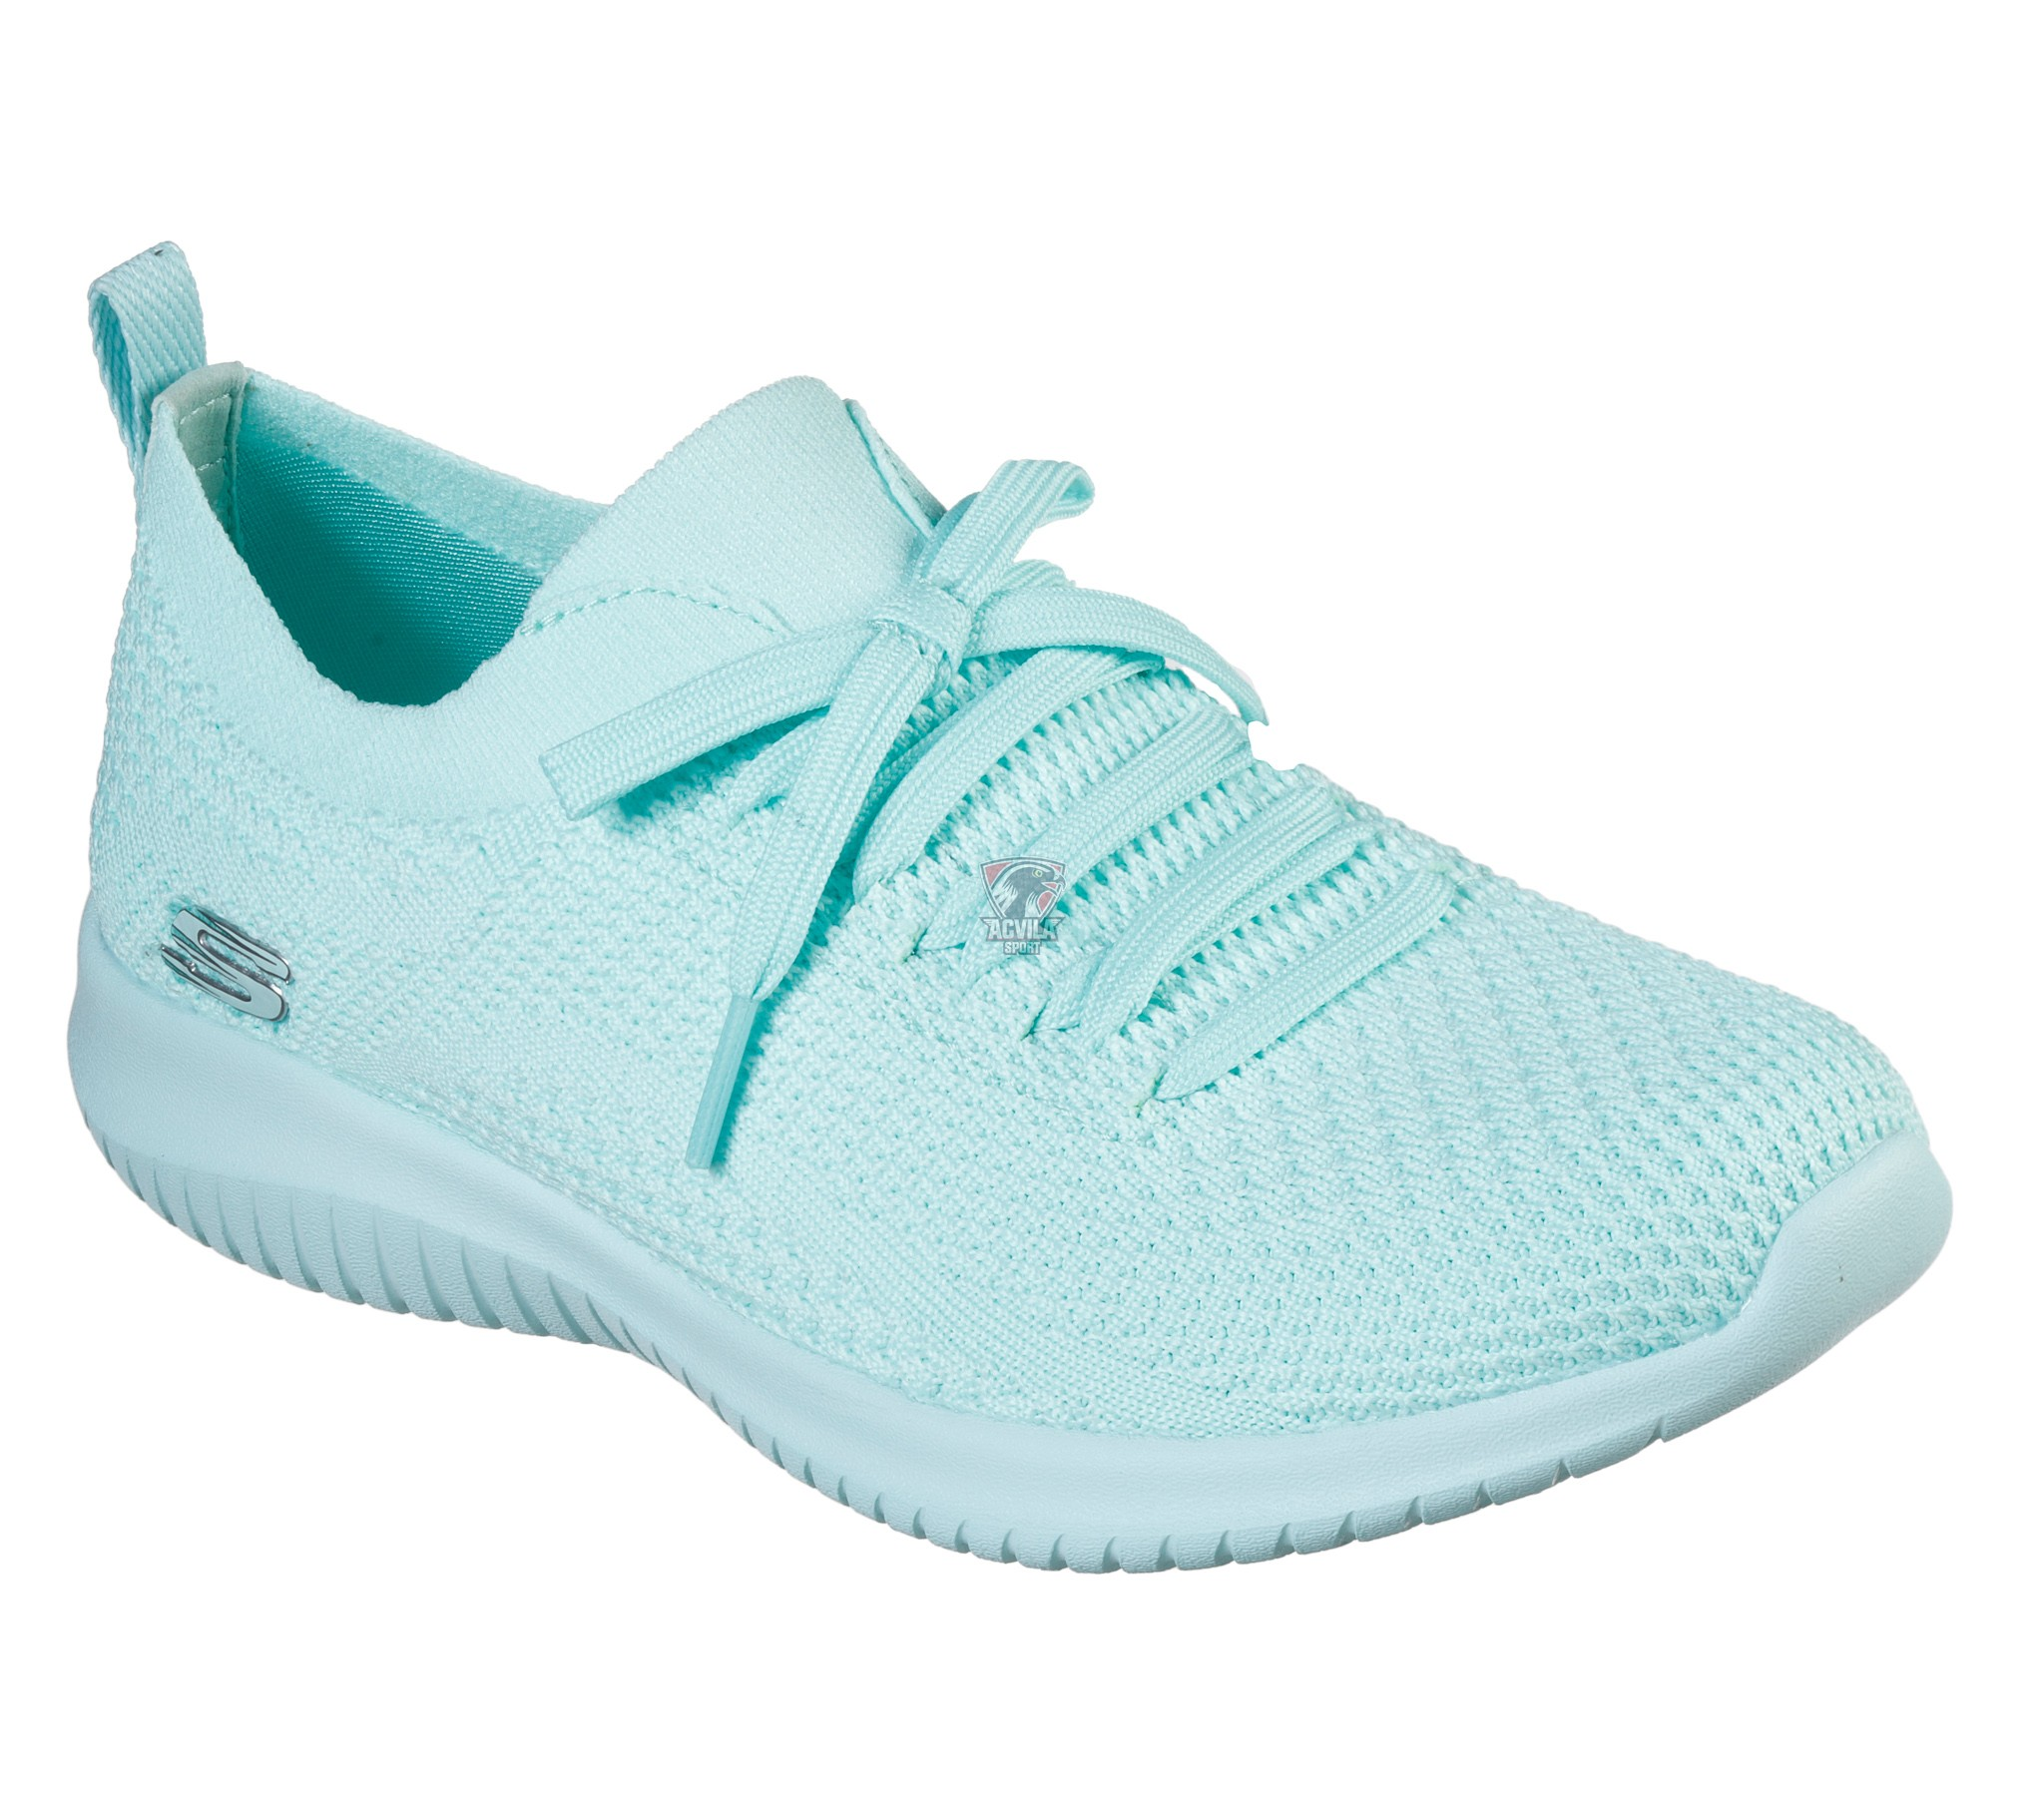 photo 1 Спортивная обувь SKECHERS ULTRA FLEX PASTEL PARTY